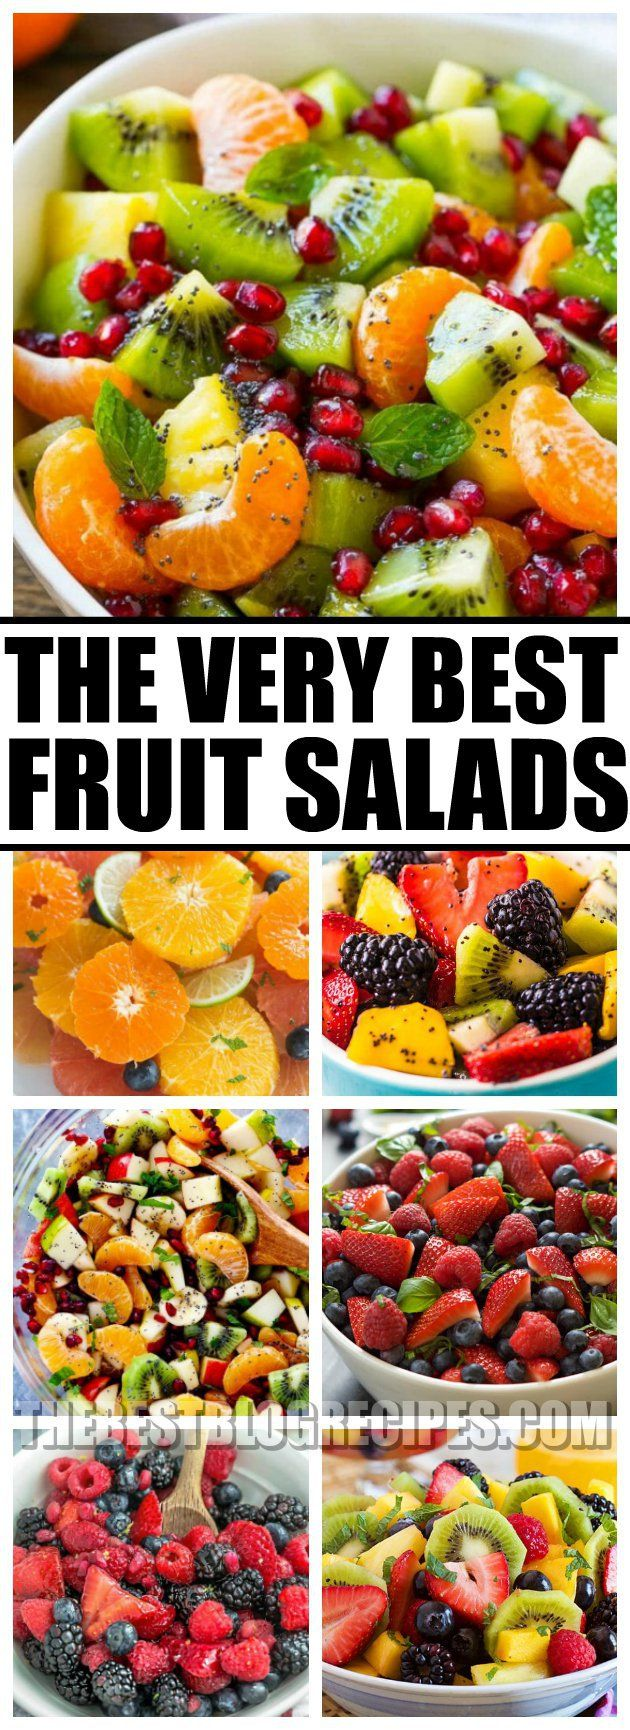 The Best Fruit Salad Recipes